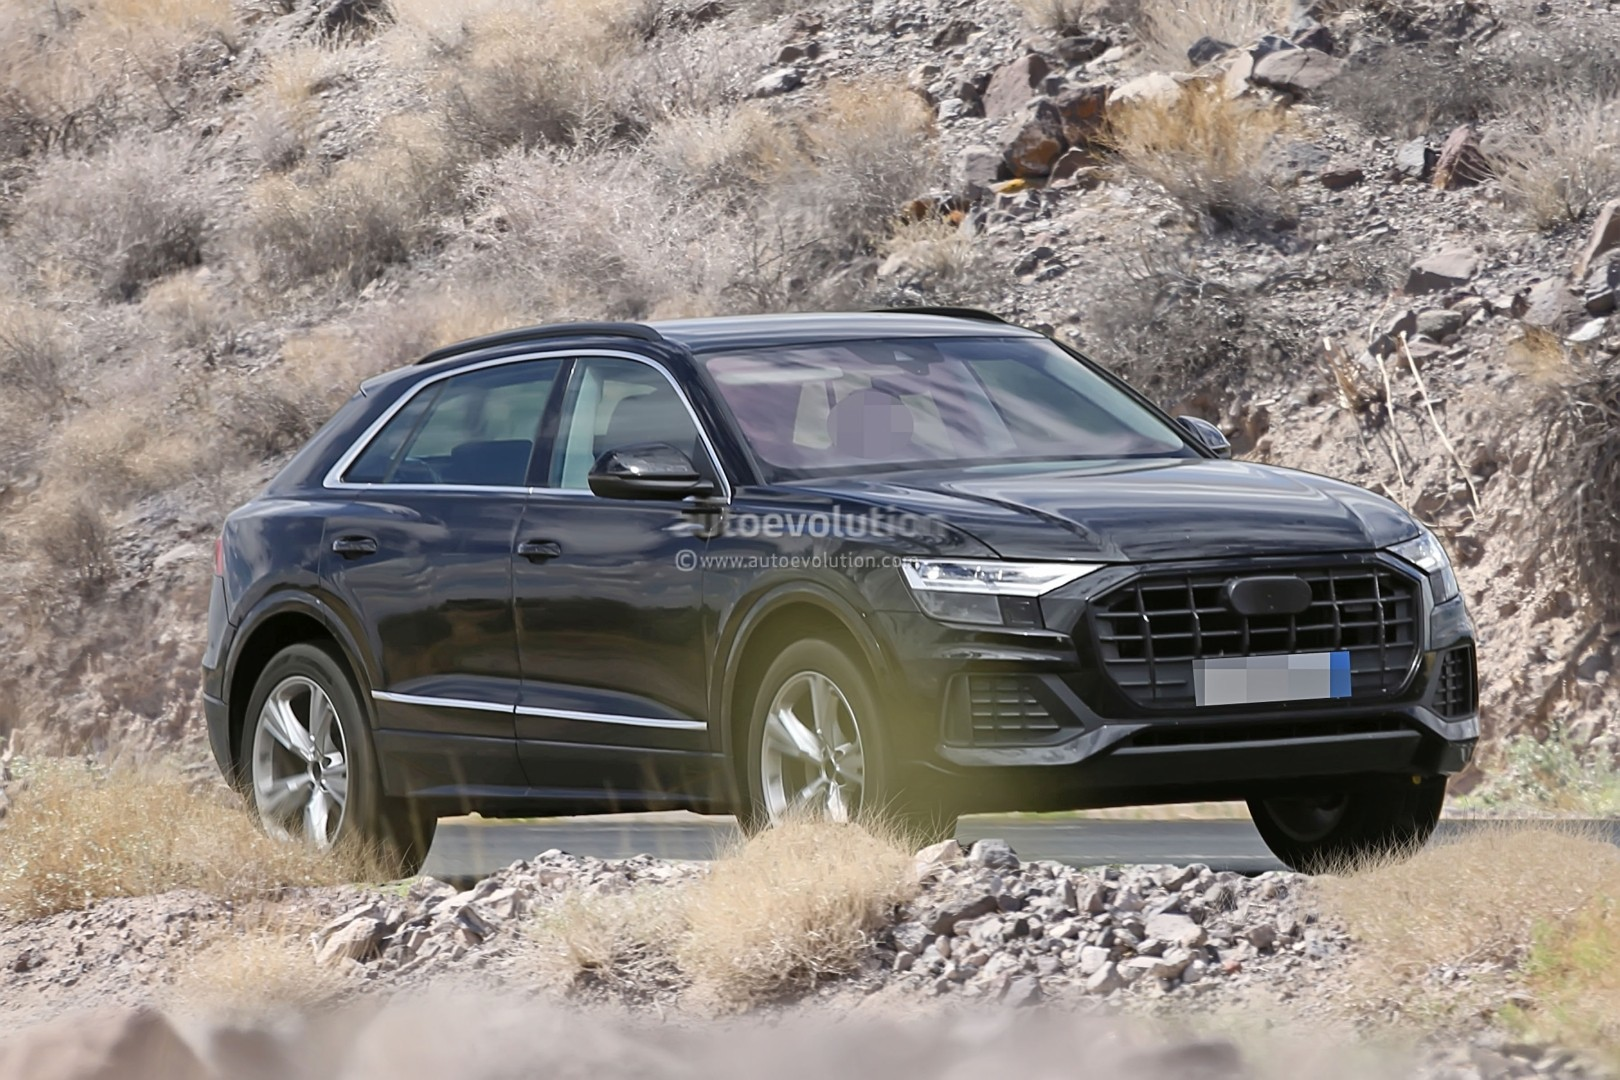 Audi Q8 Halo Suv Model Confirmed Q7 Platform And Prologue